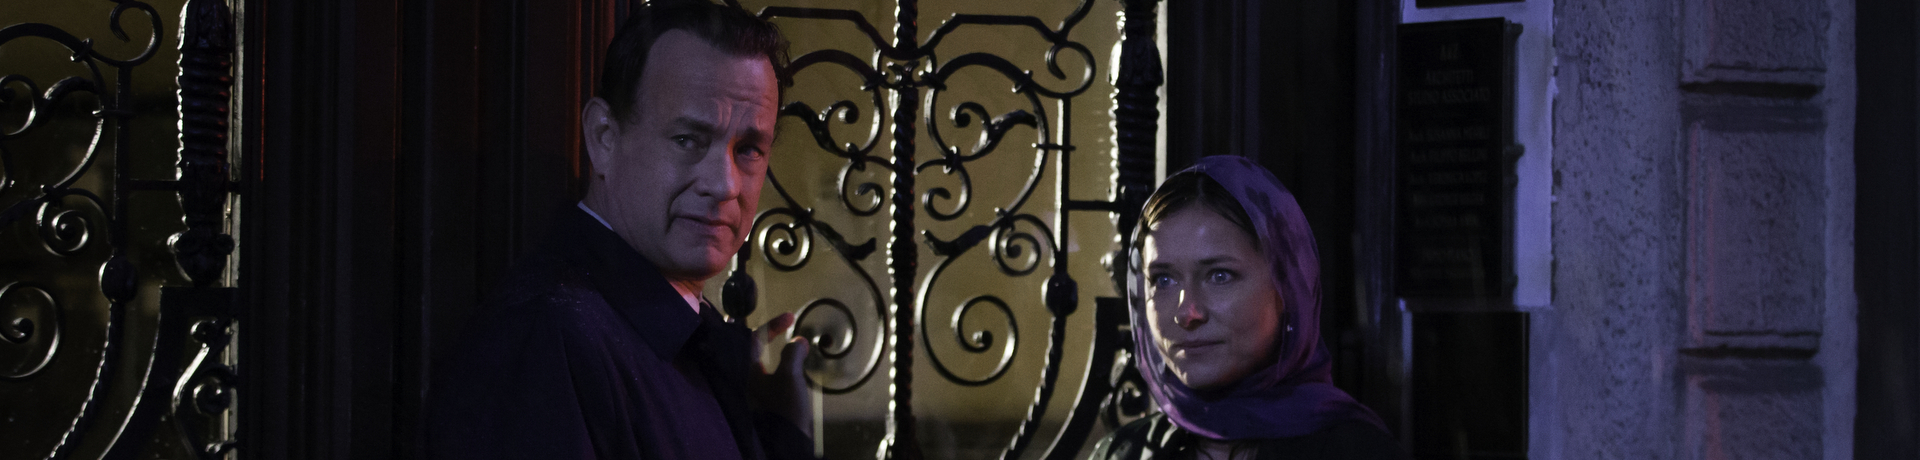 "Tom Hanks and Sidse Babett Knudsen star in Columbia Pictures'""Inferno,"" also starring Felicity Jones."